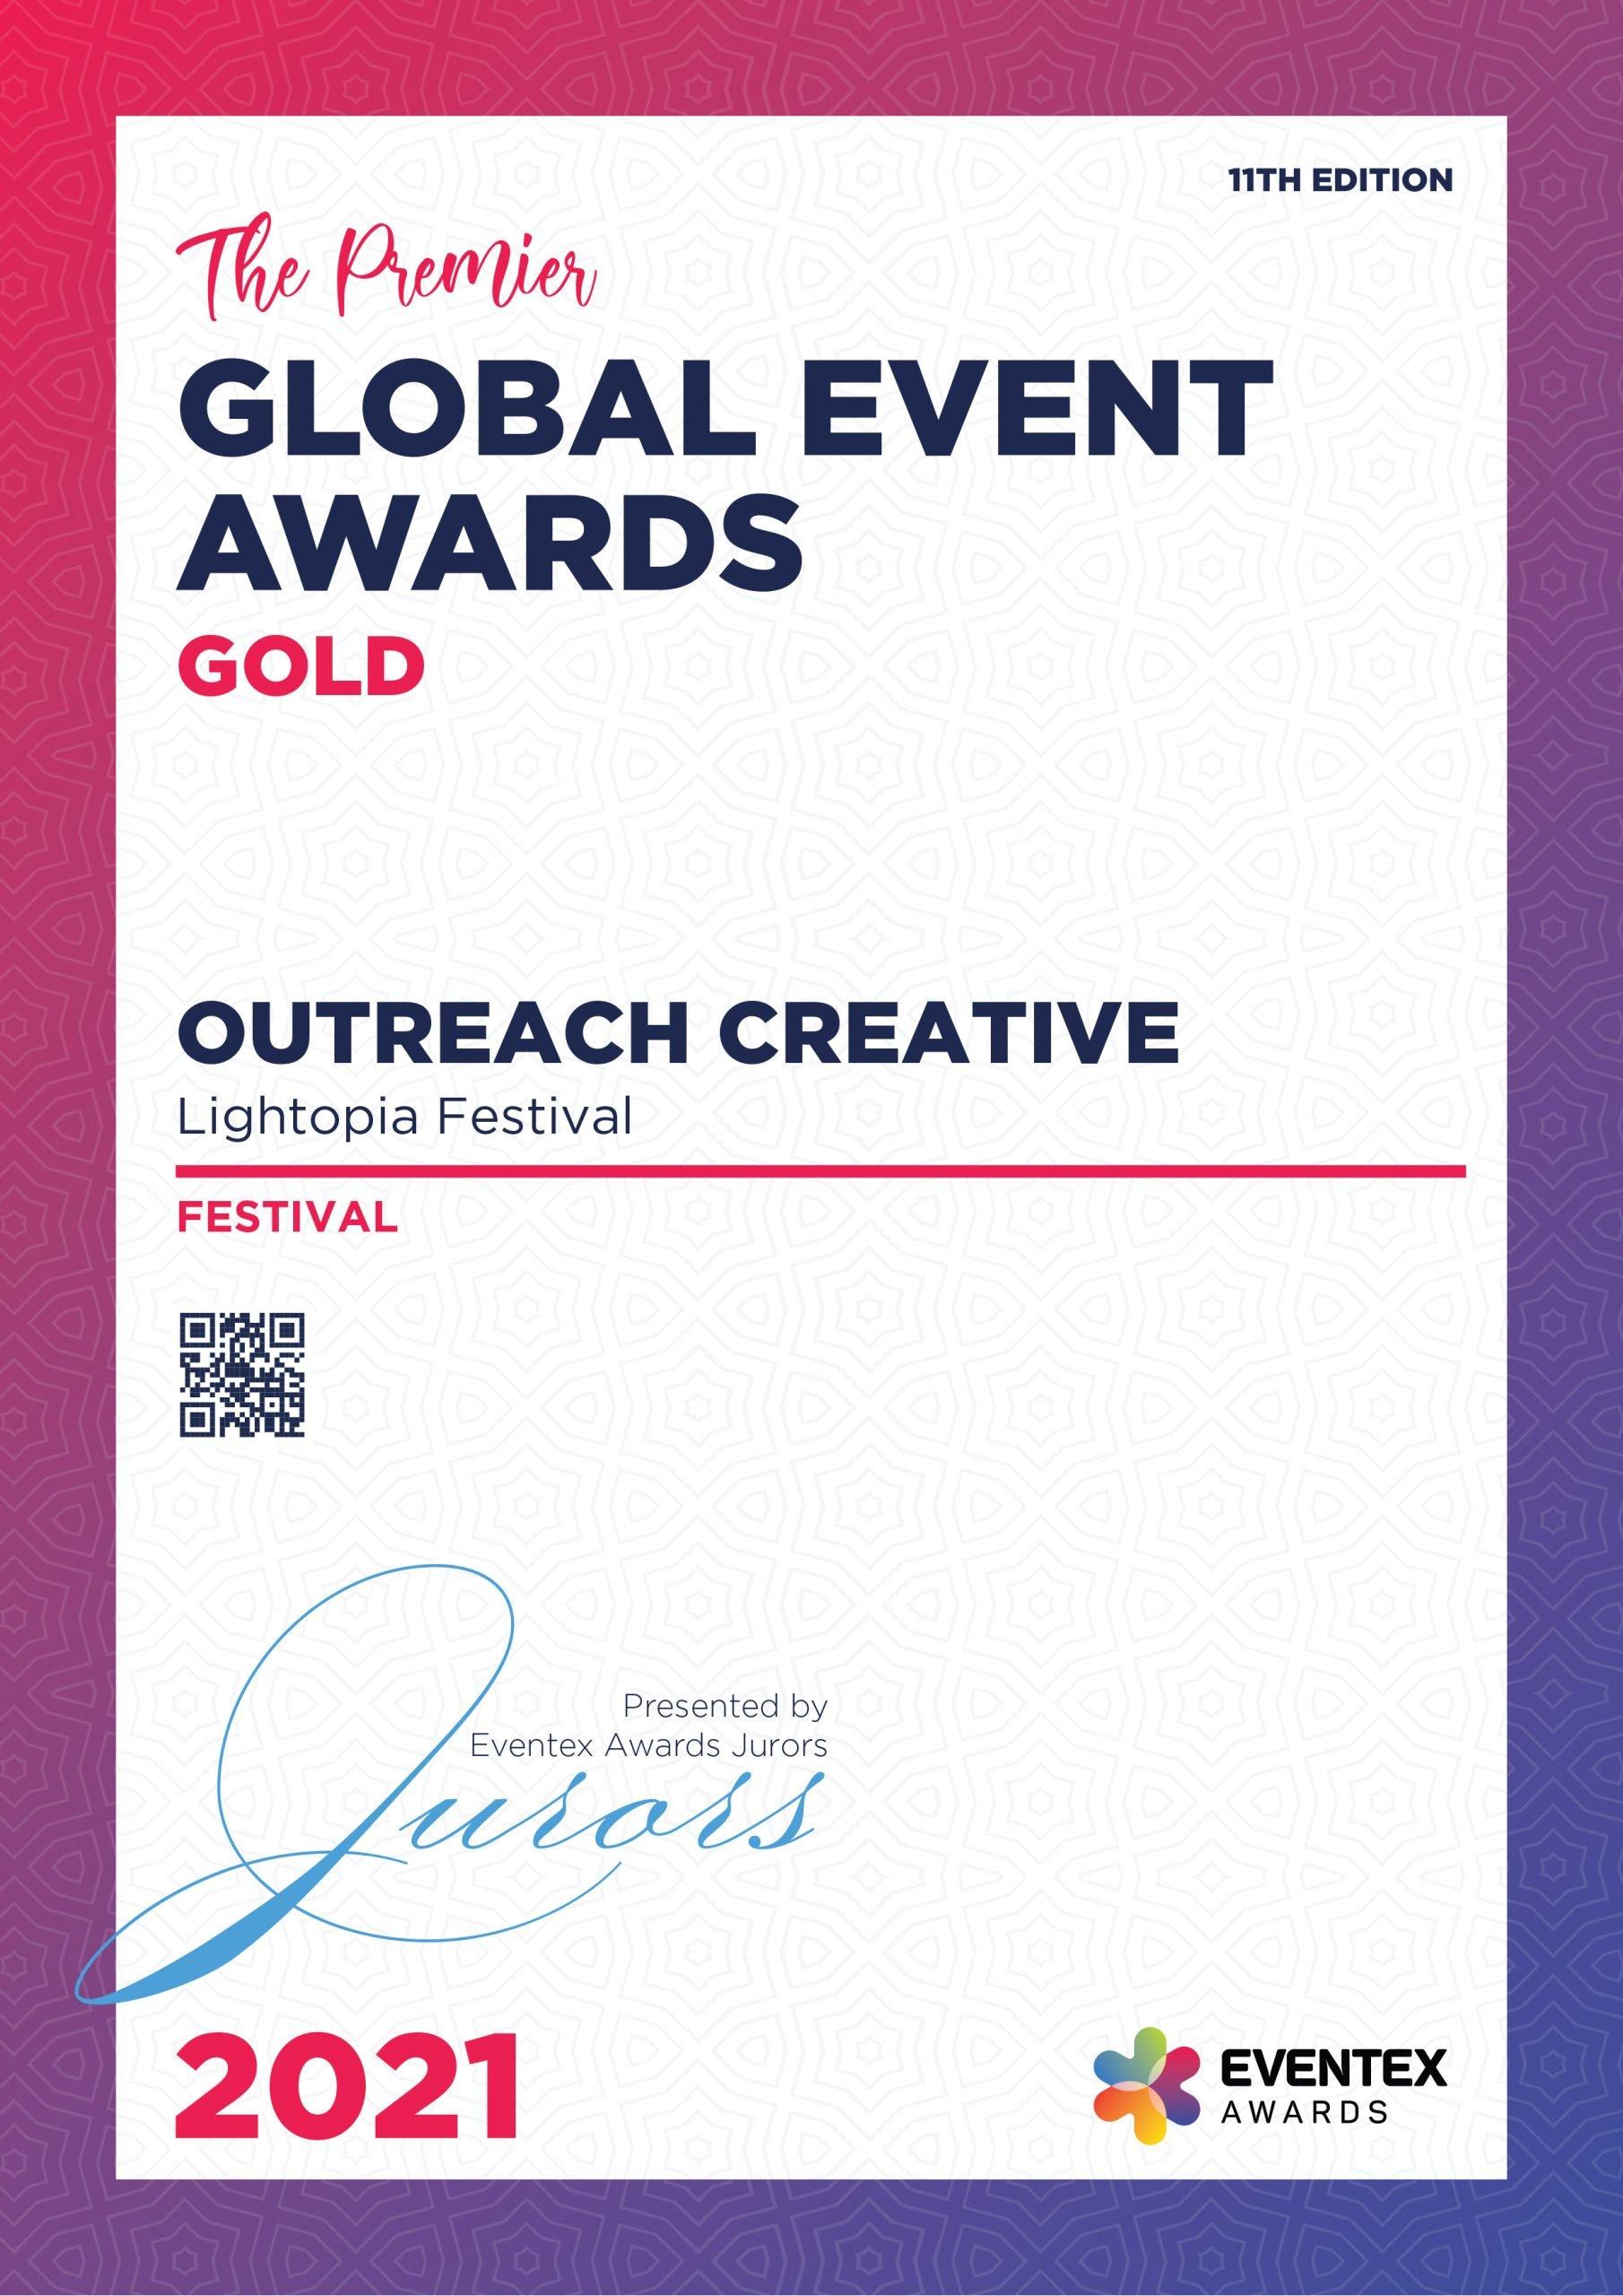 OUTREACH CREATIVE-Festival-Gold-Eventex-2021